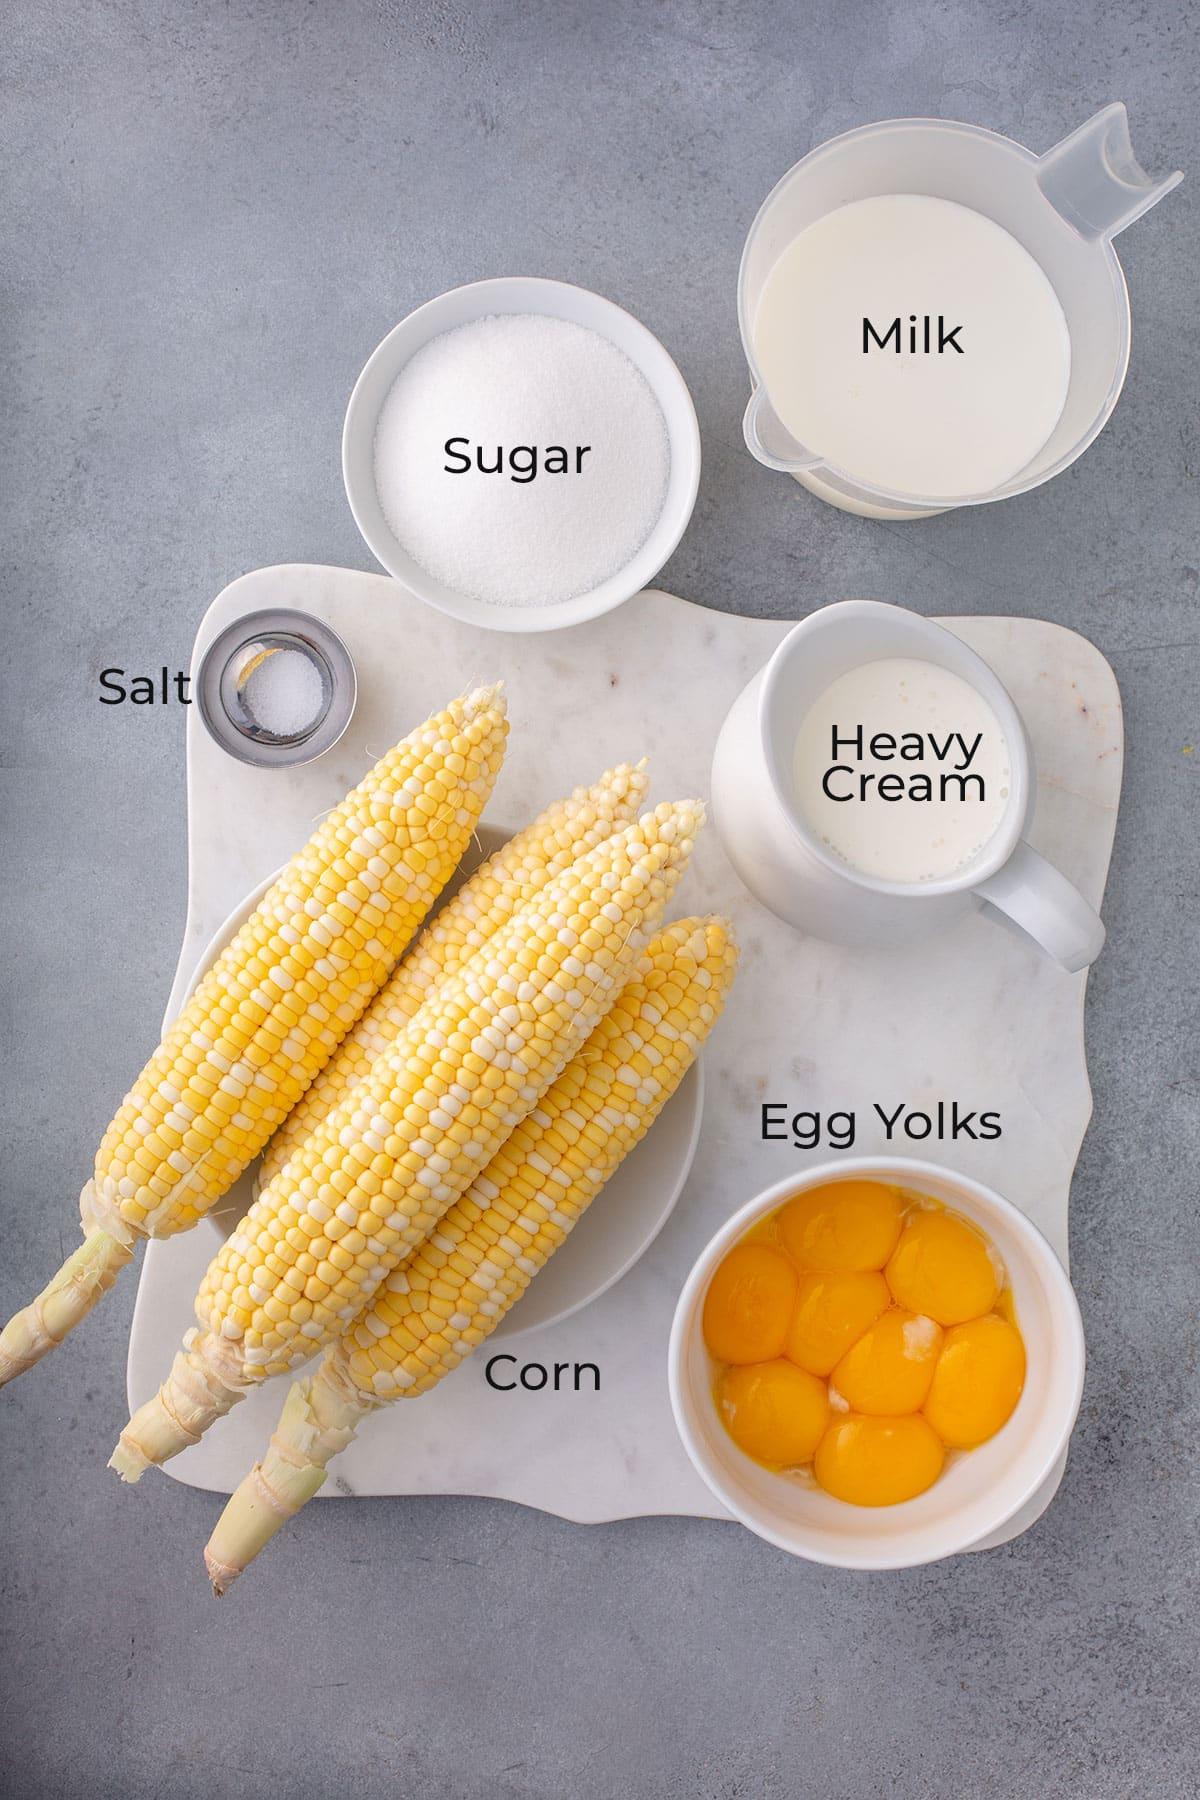 Ingredients to make sweet corn ice cream